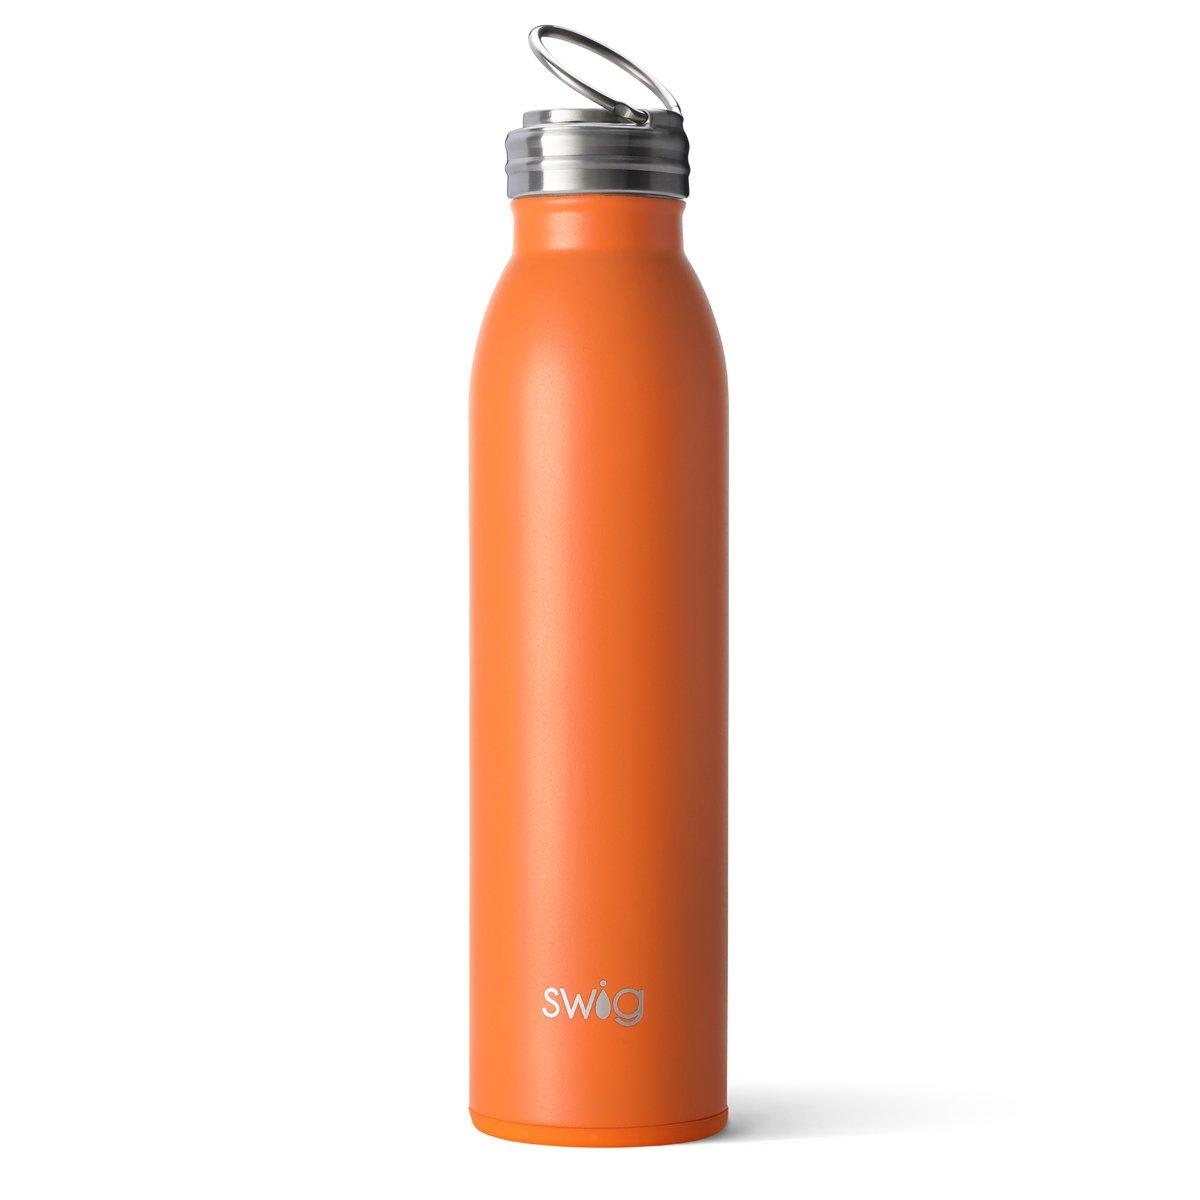 Swig 20 oz. Bottle Matte Orange